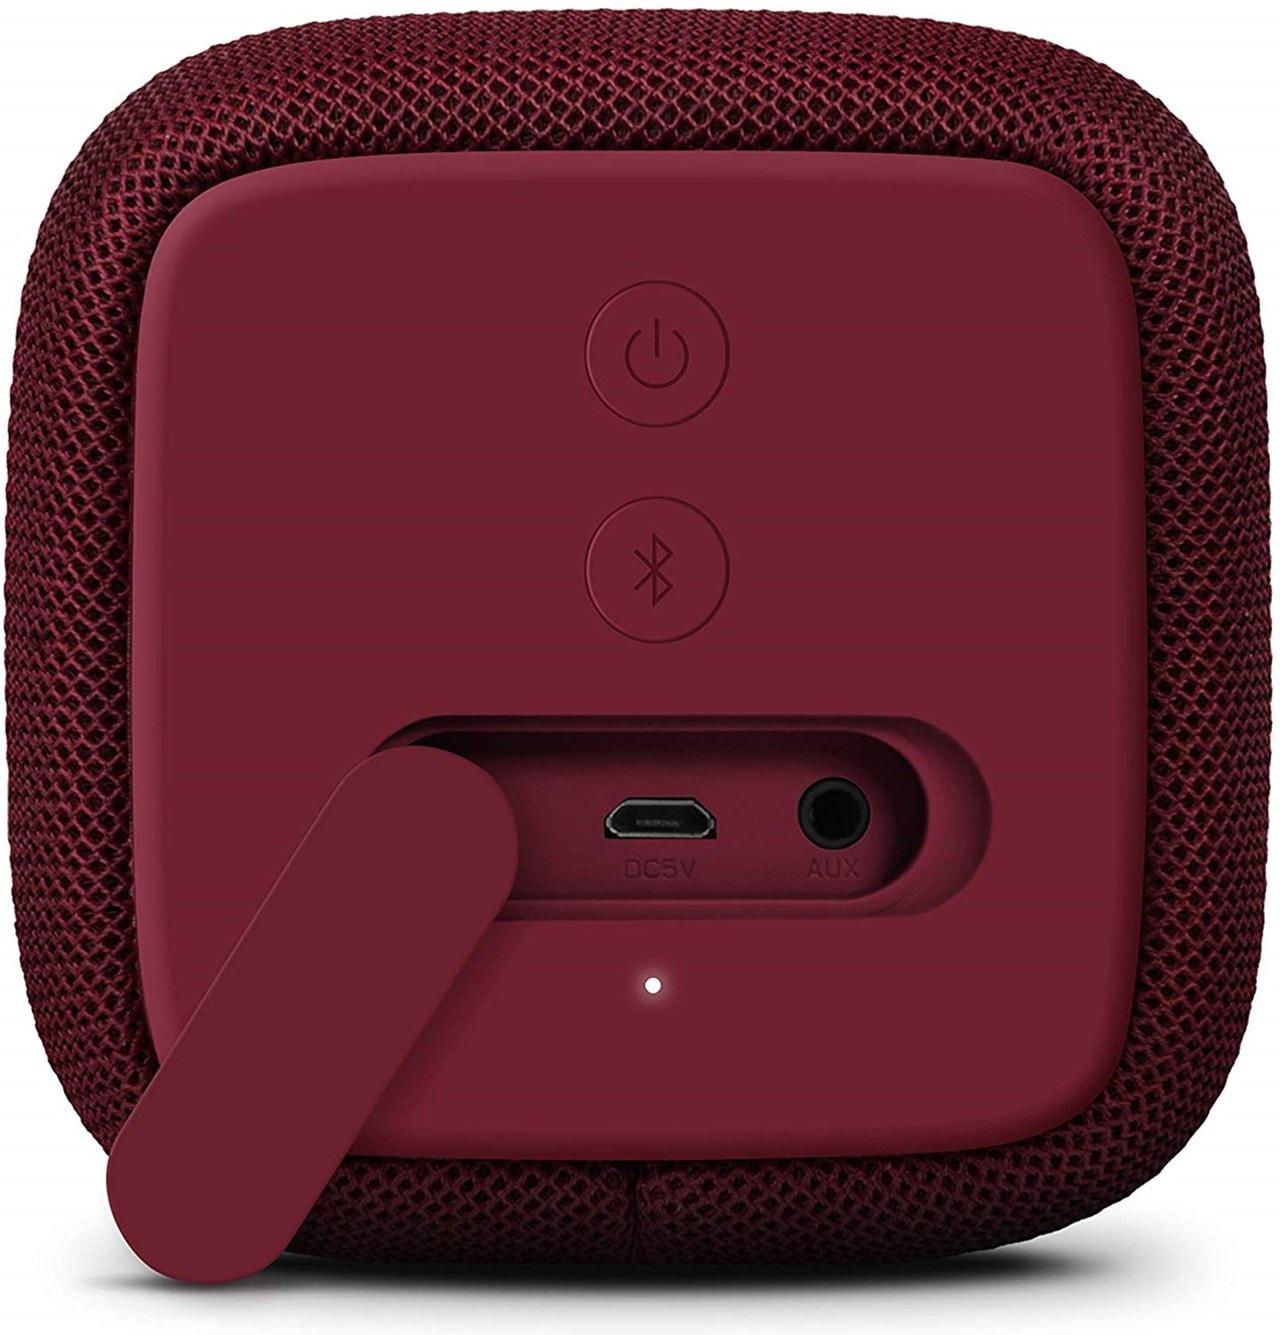 Fresh n Rebel Bold S Ruby Red Bluetooth Speaker - 2